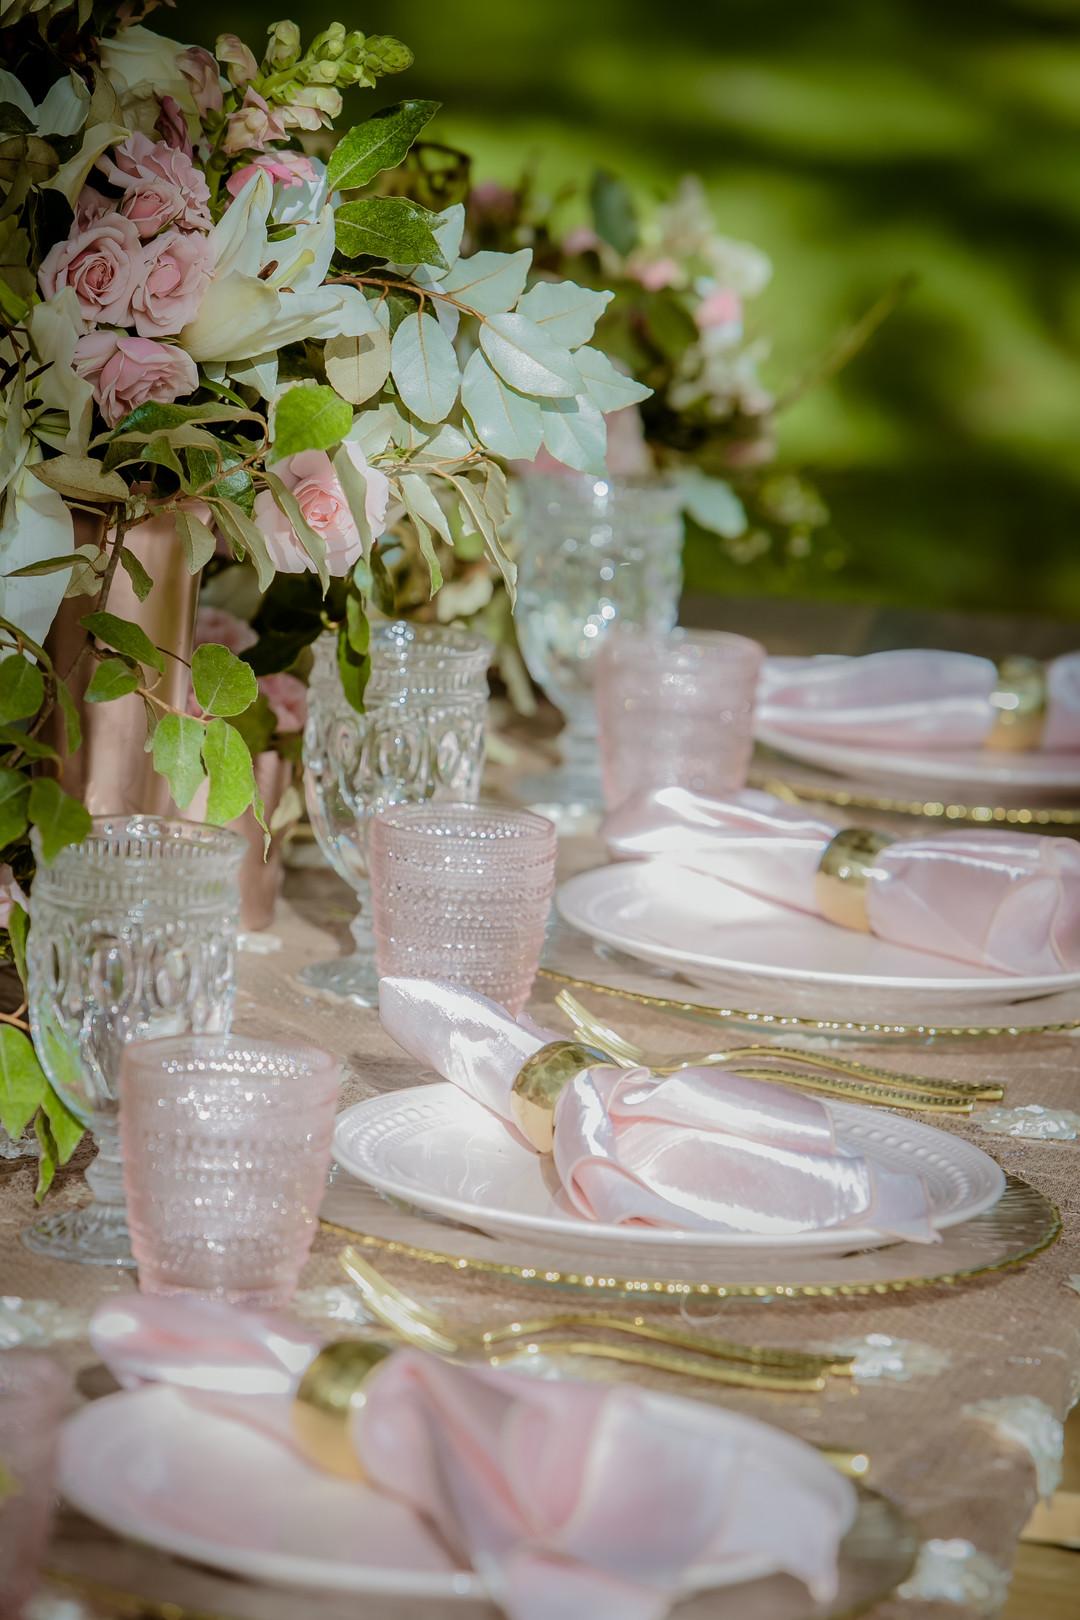 rose-hill-mansion-wedding-18.jpg